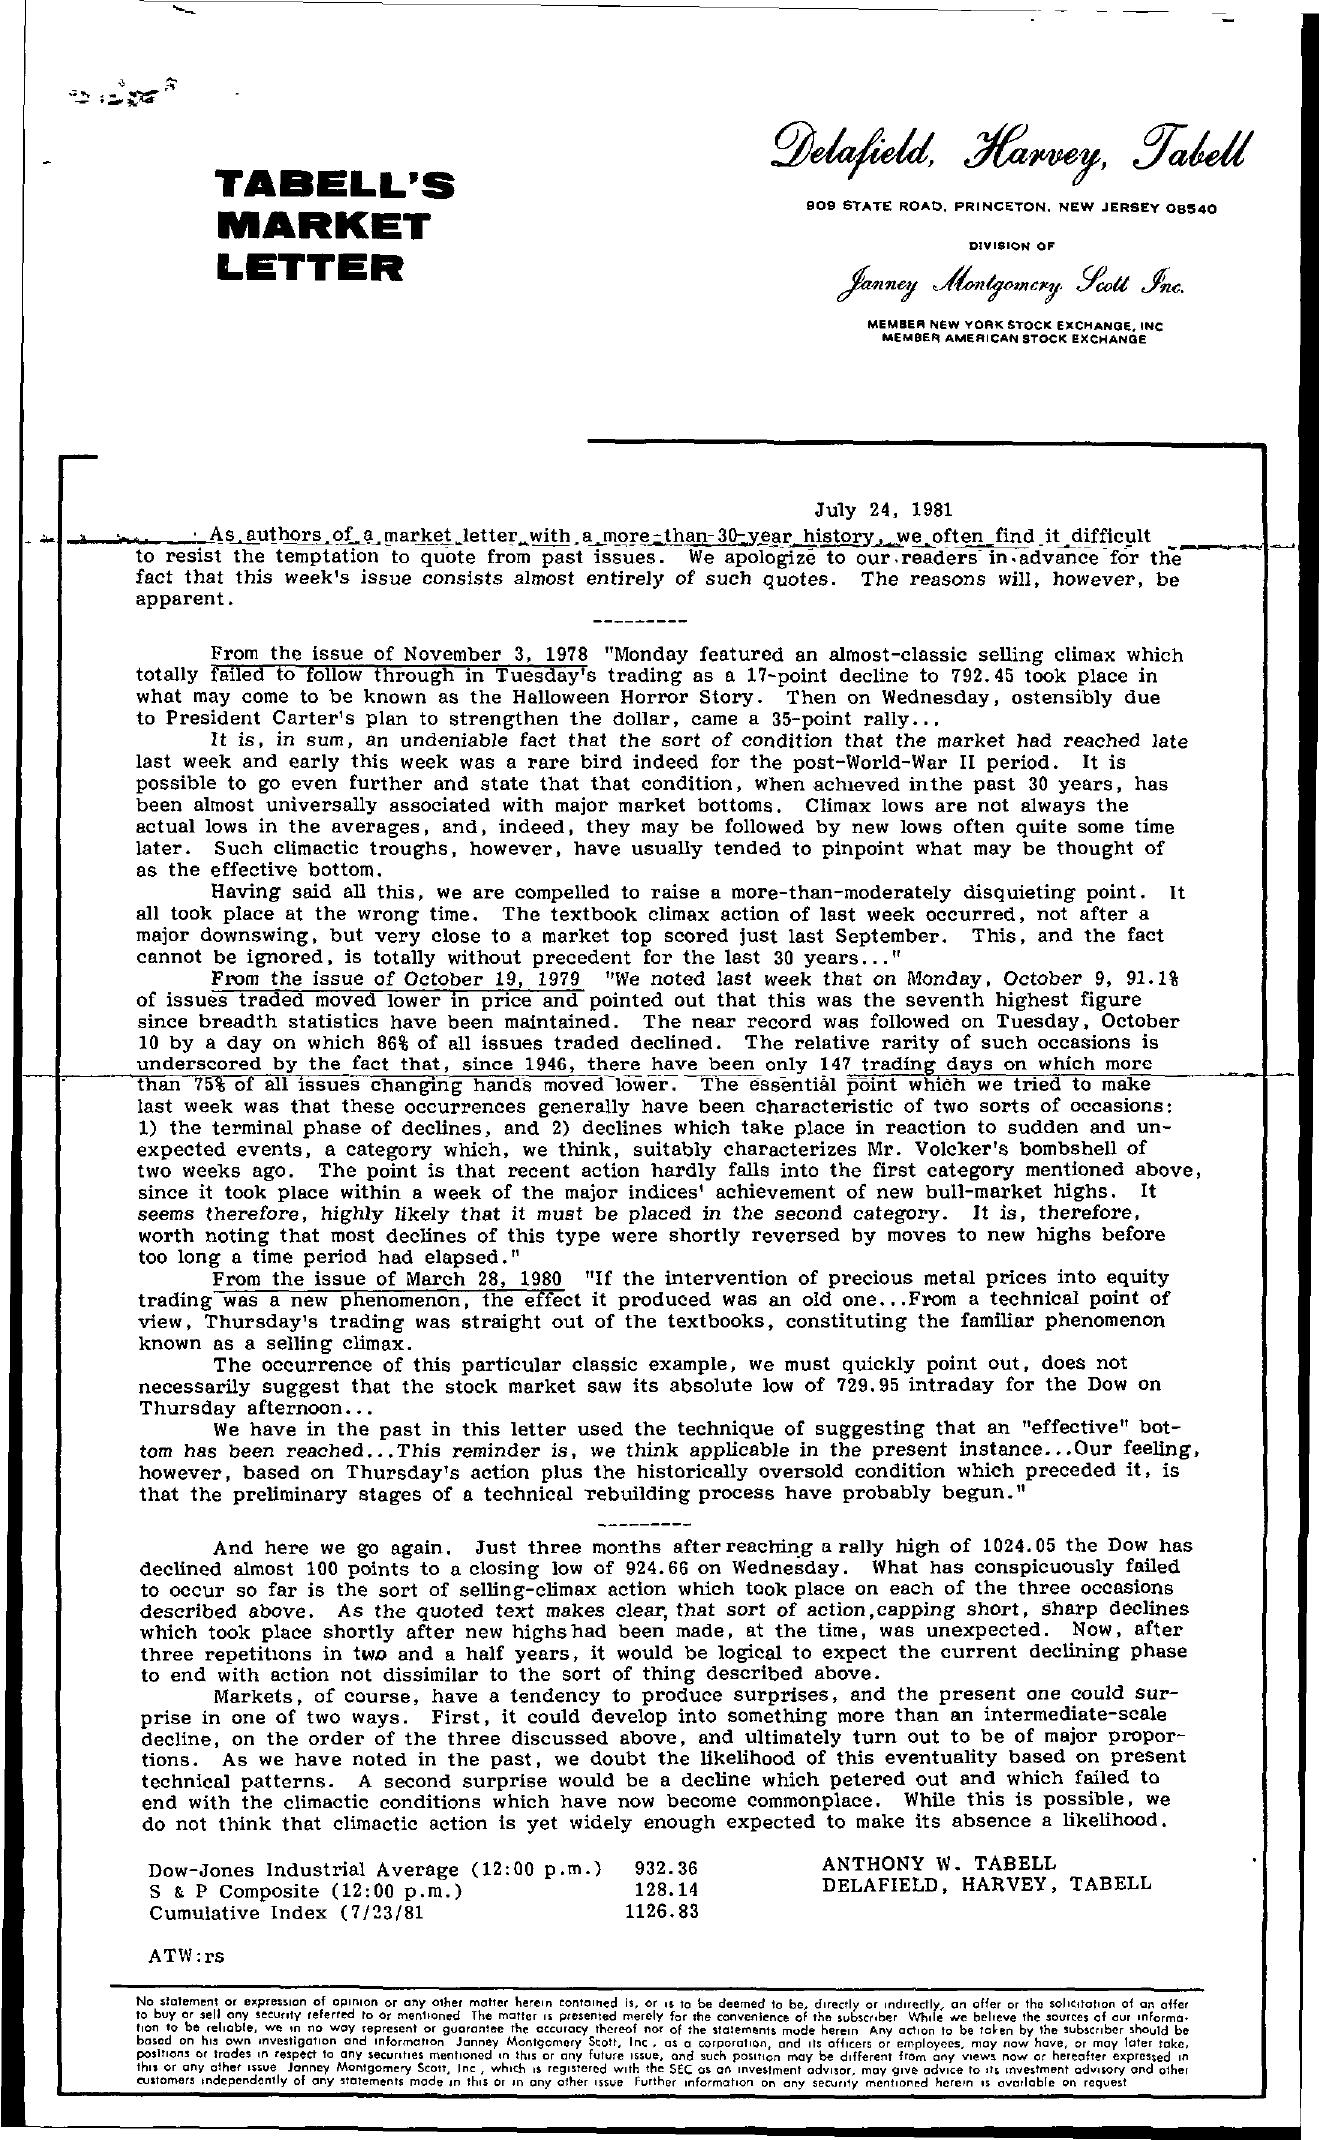 Tabell's Market Letter - July 24, 1981